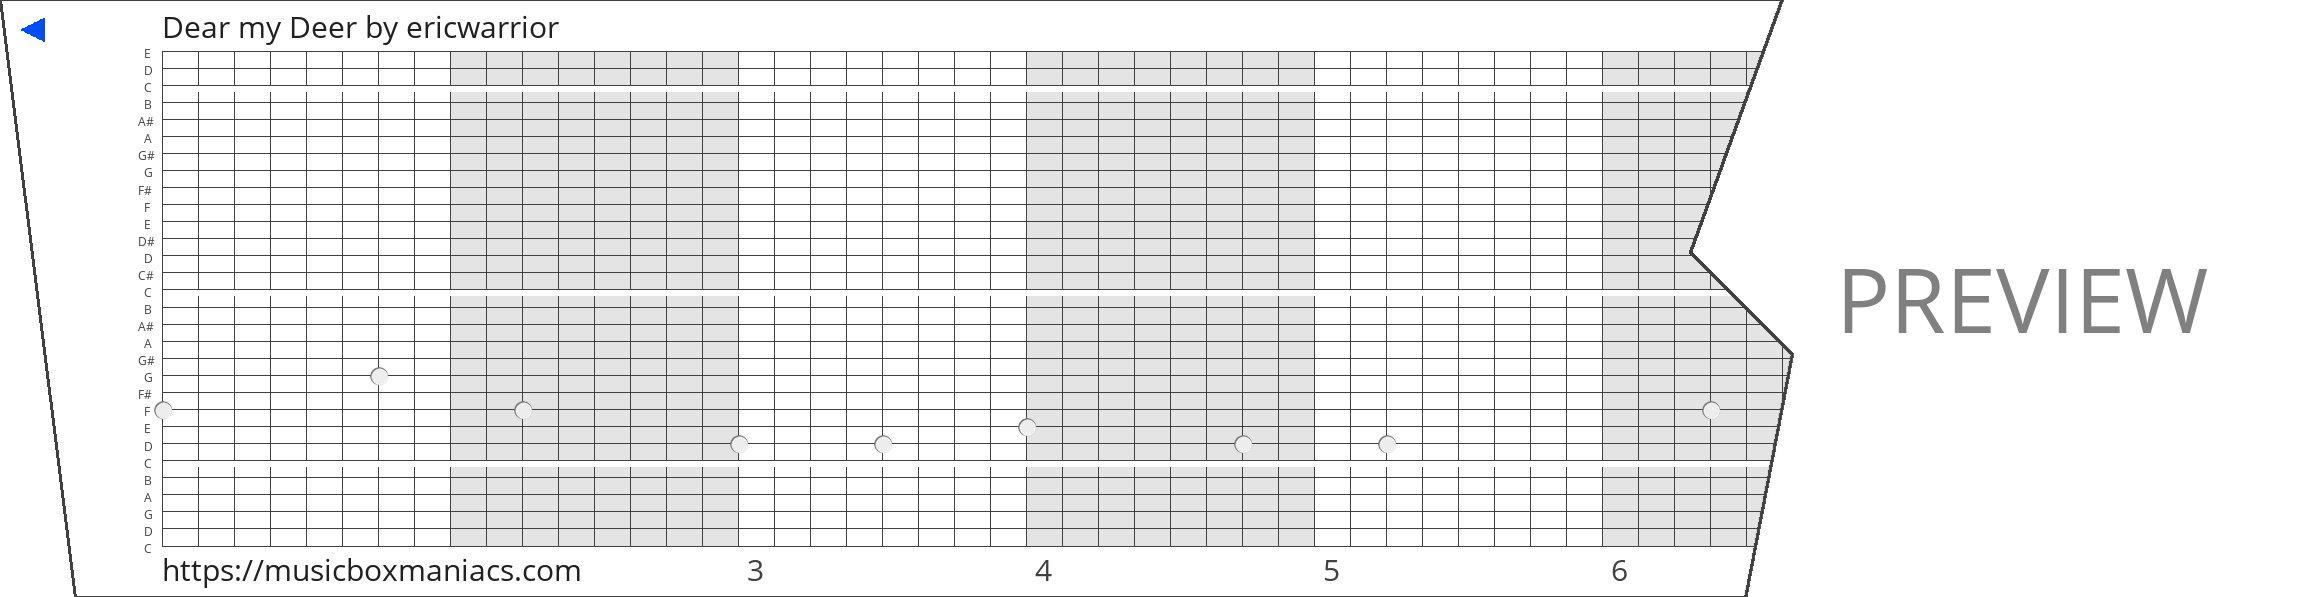 Dear my Deer 30 note music box paper strip